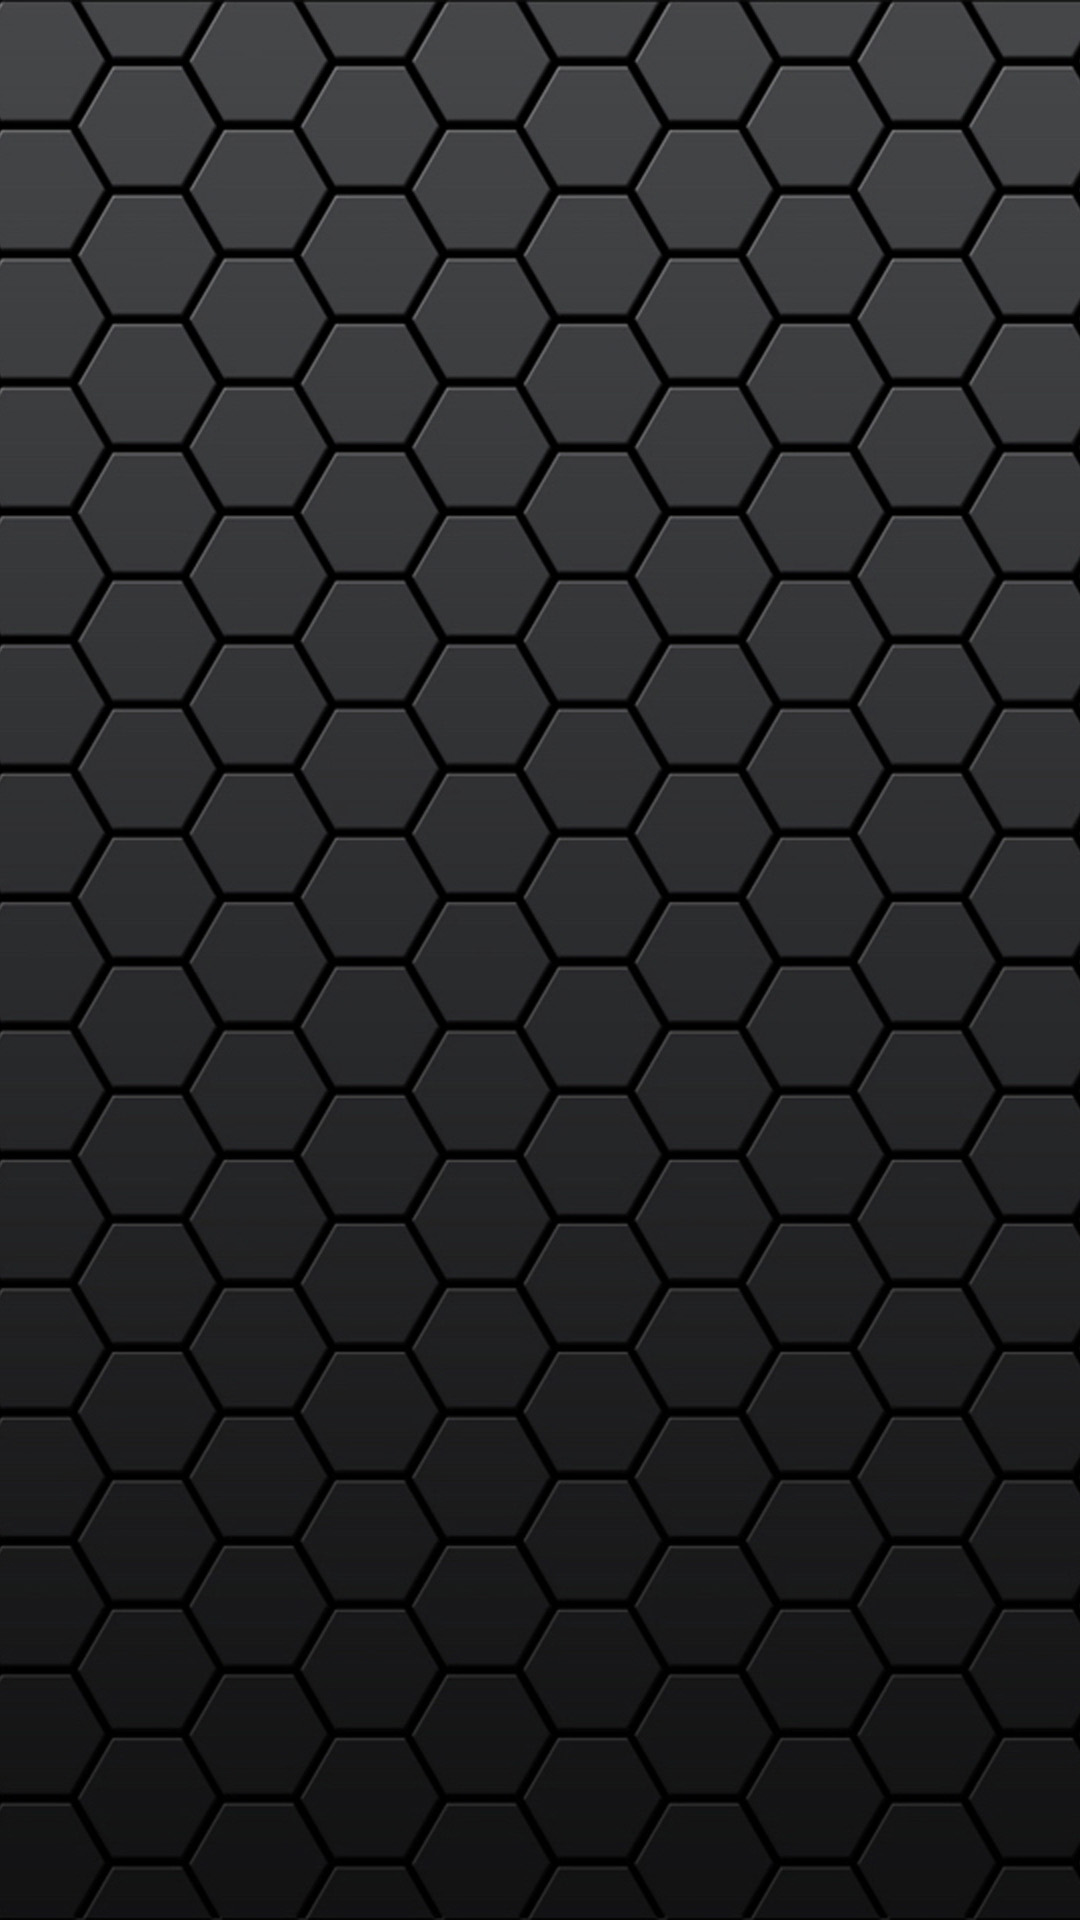 7+ Honeycomb.jpg